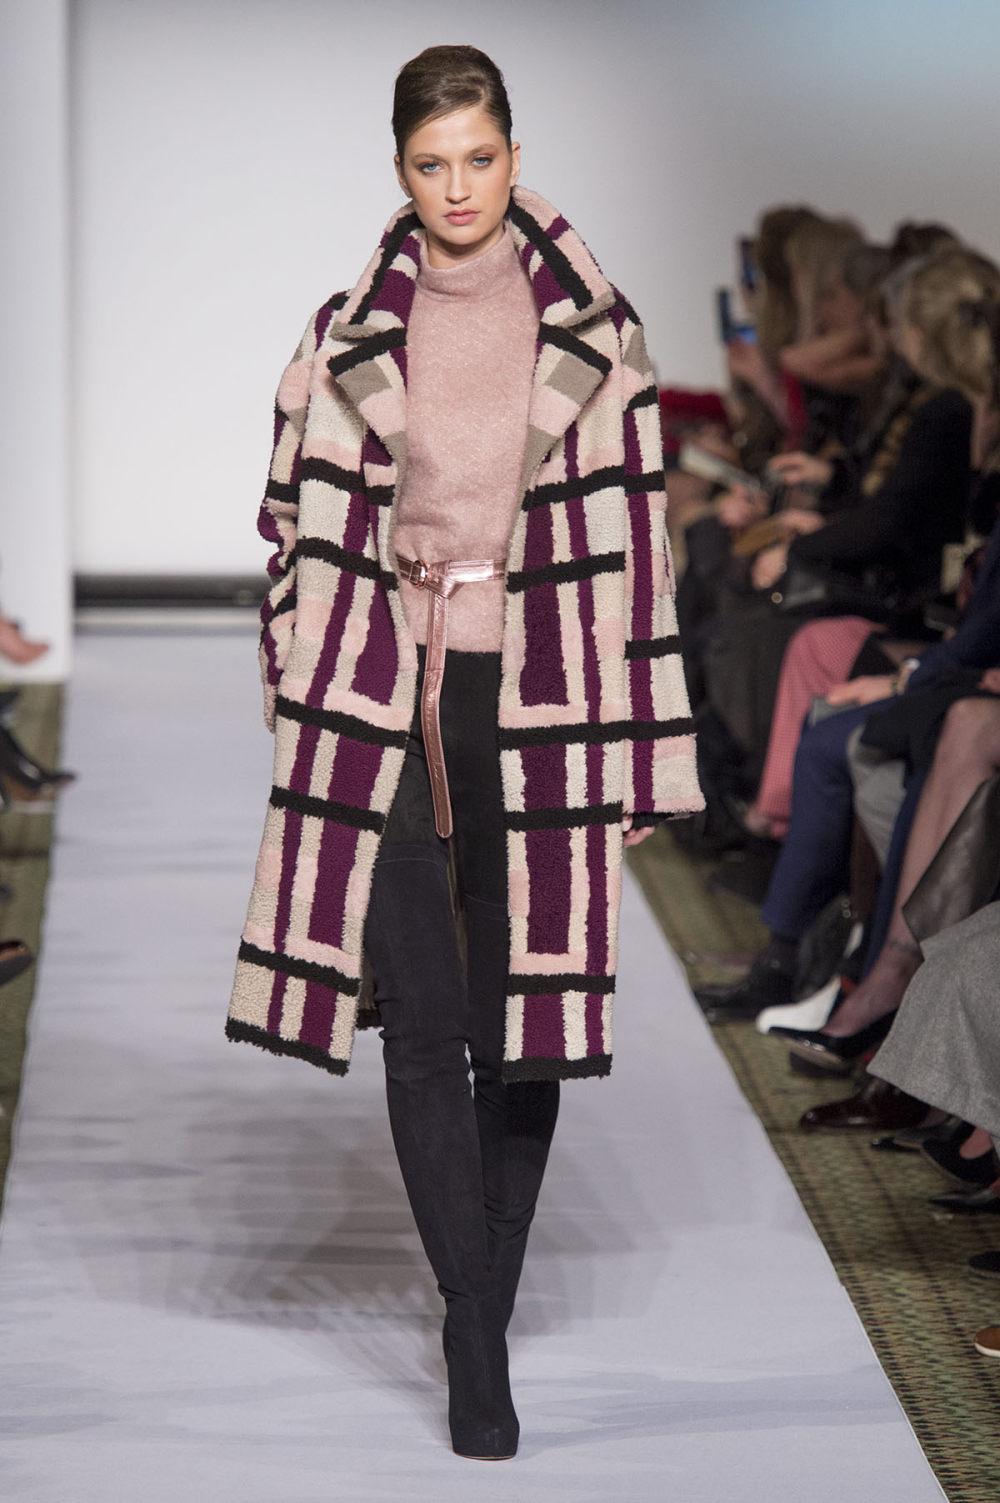 Carolina Herrera时装系列用鲜艳的颜色充满智能的黑白色调-22.jpg